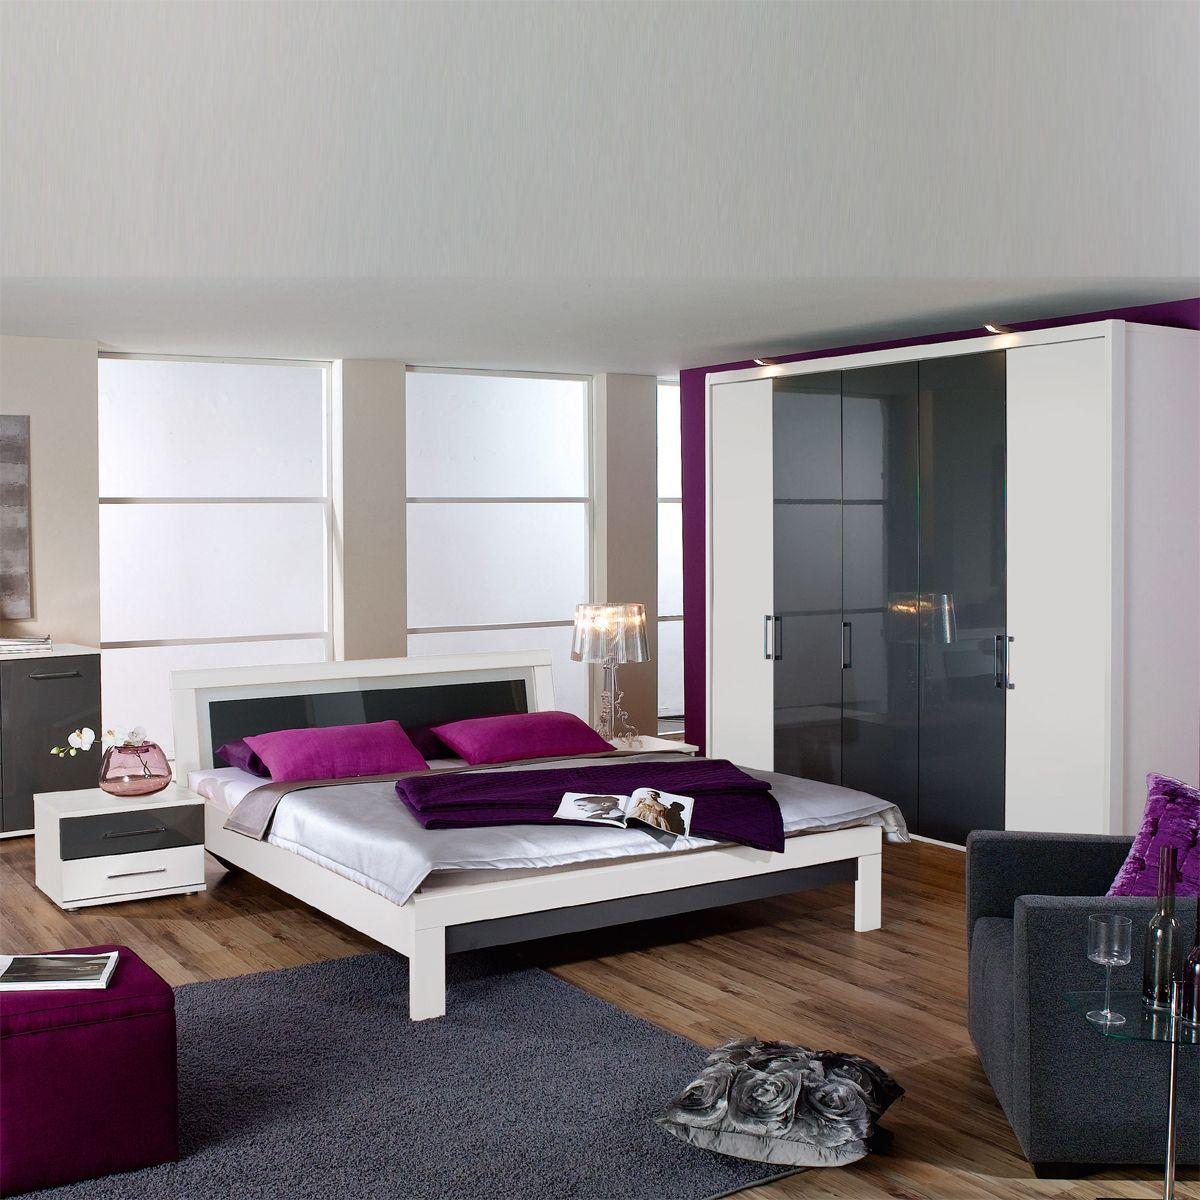 Massivholz Möbel online kaufen Haus deko, Online möbel